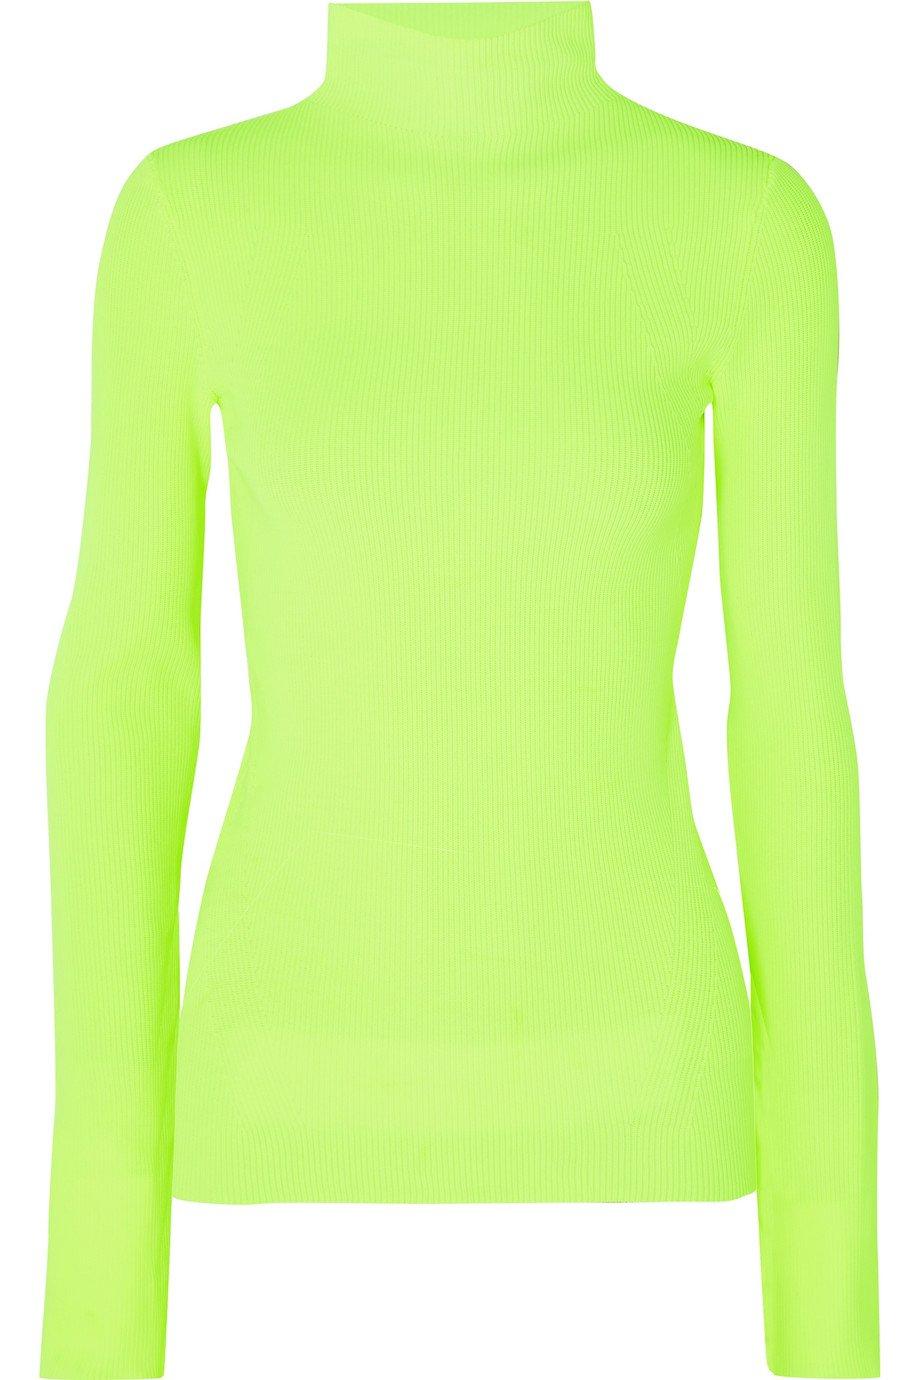 Helmut Lang   Neon ribbed cotton turtleneck sweater   NET-A-PORTER.COM